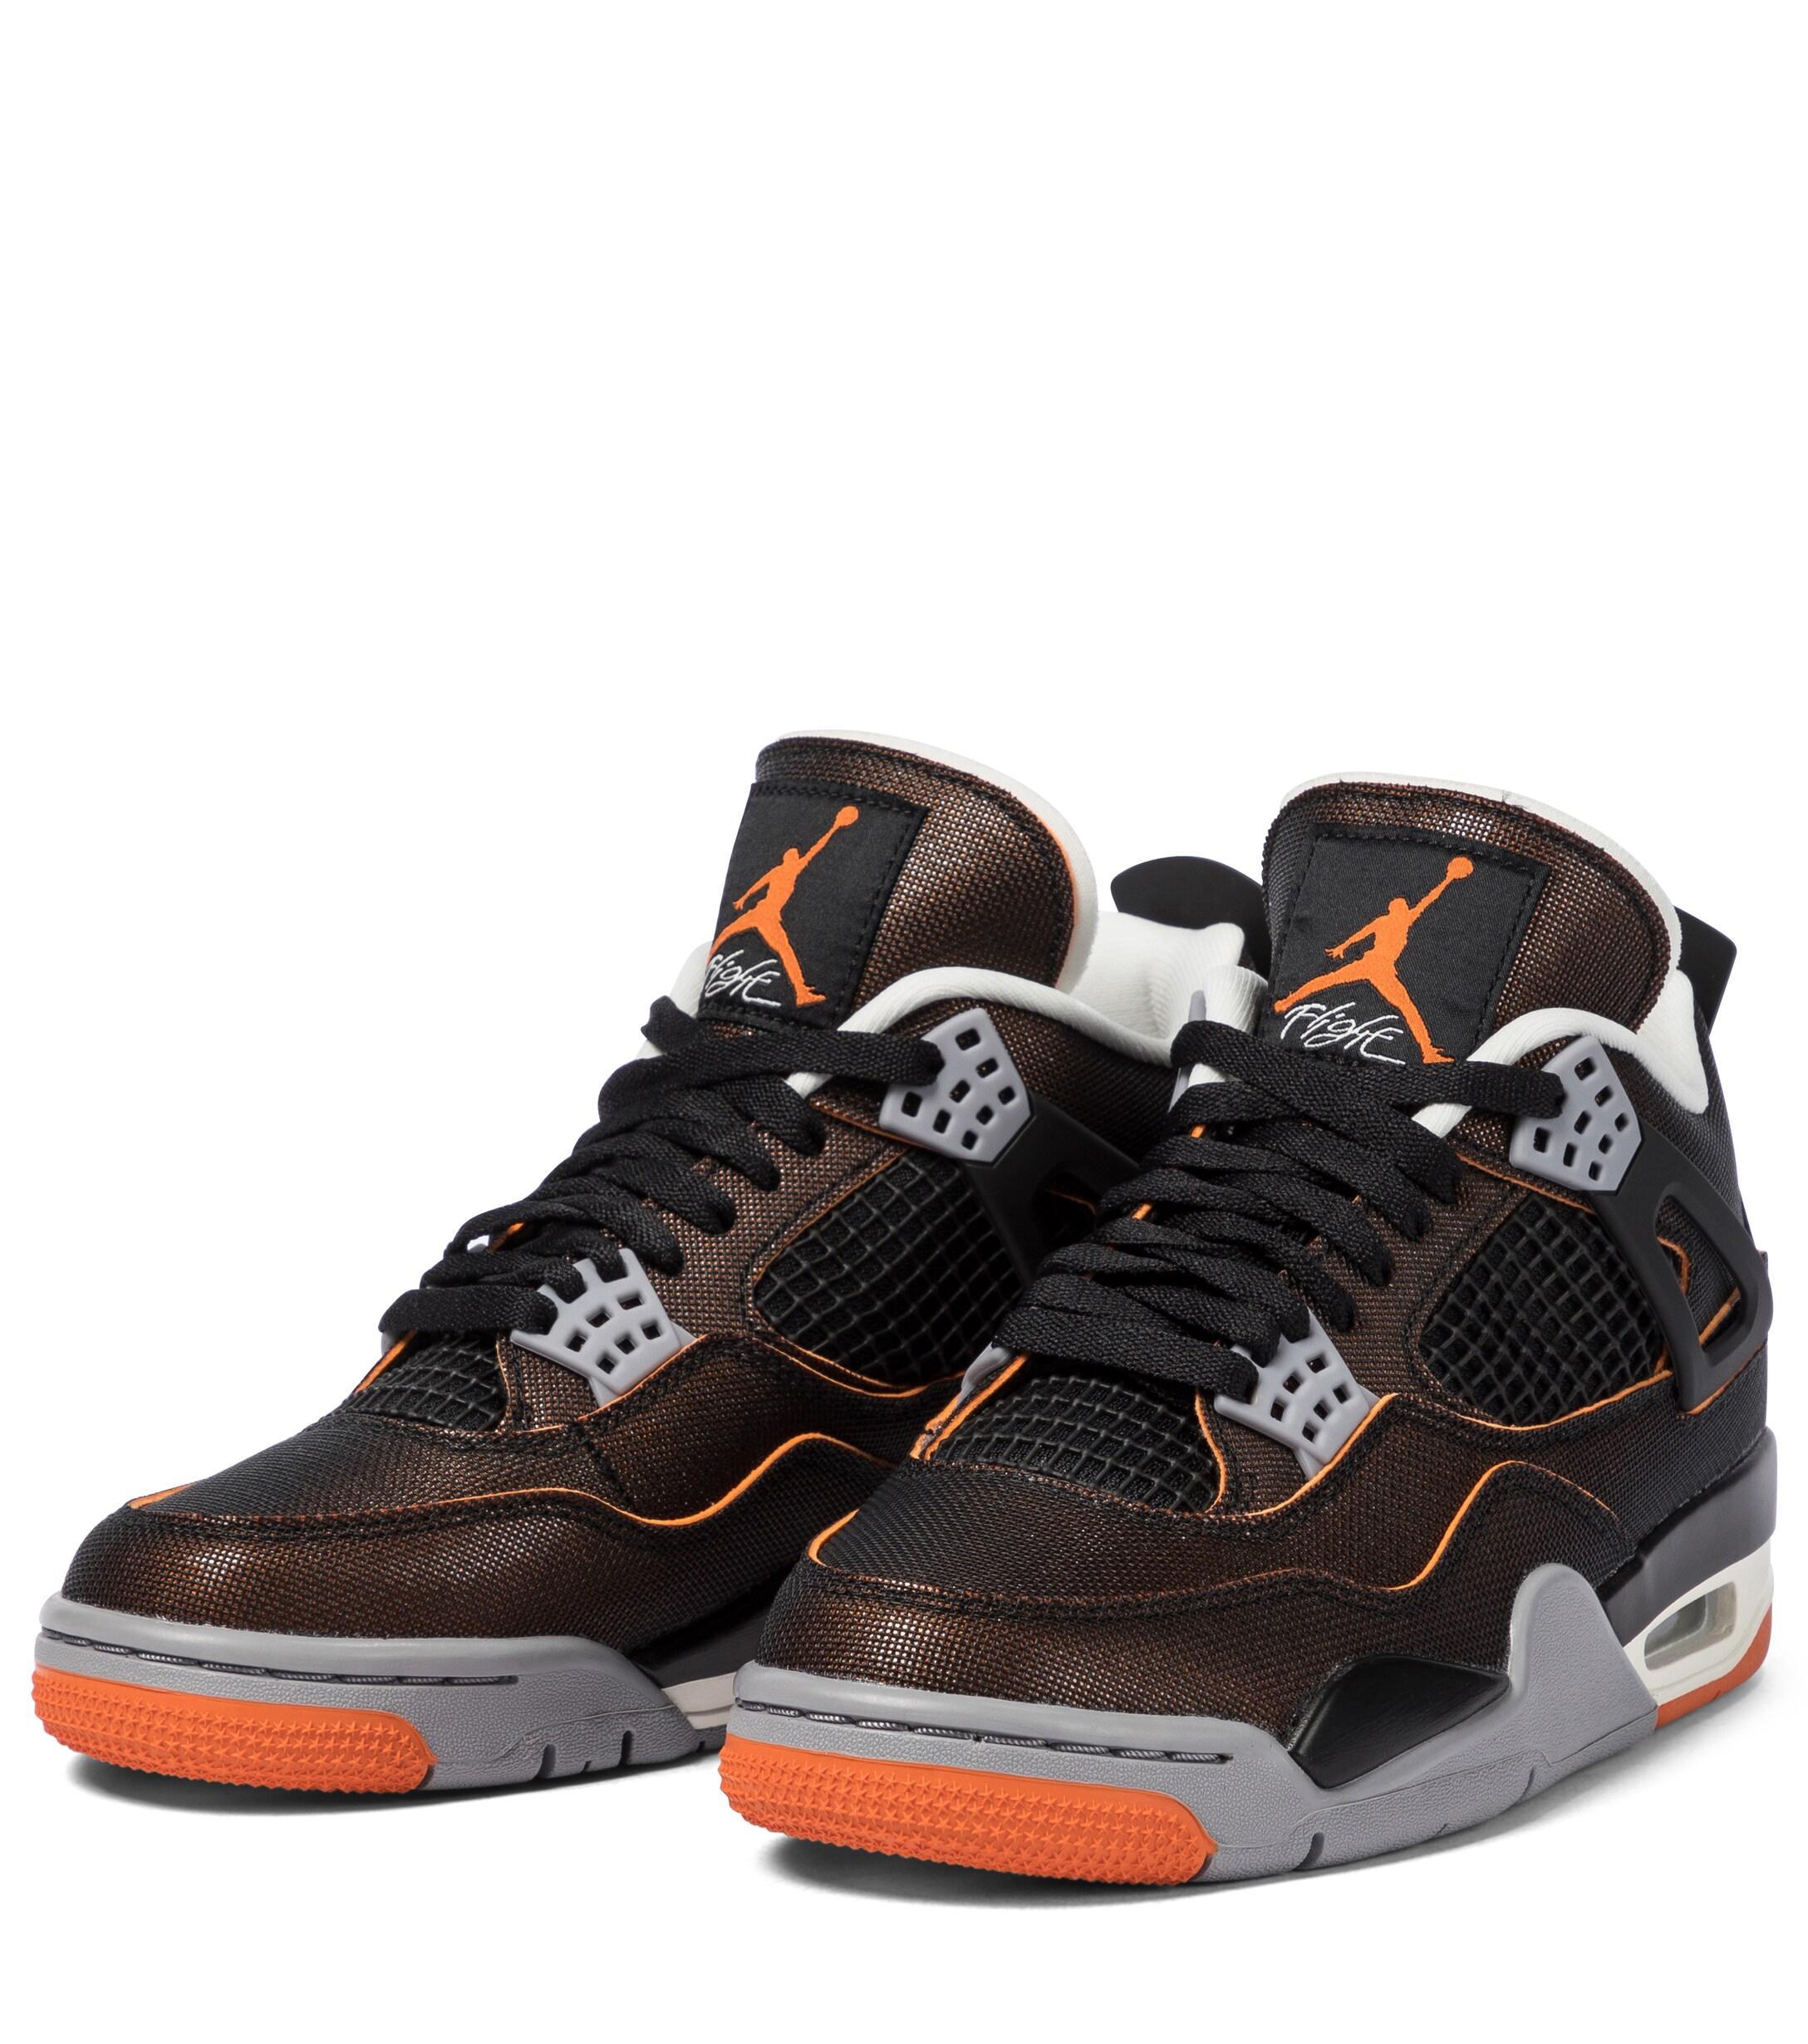 Baskets Air Jordan 4 Retro SE Nike en coloris Noir - Lyst